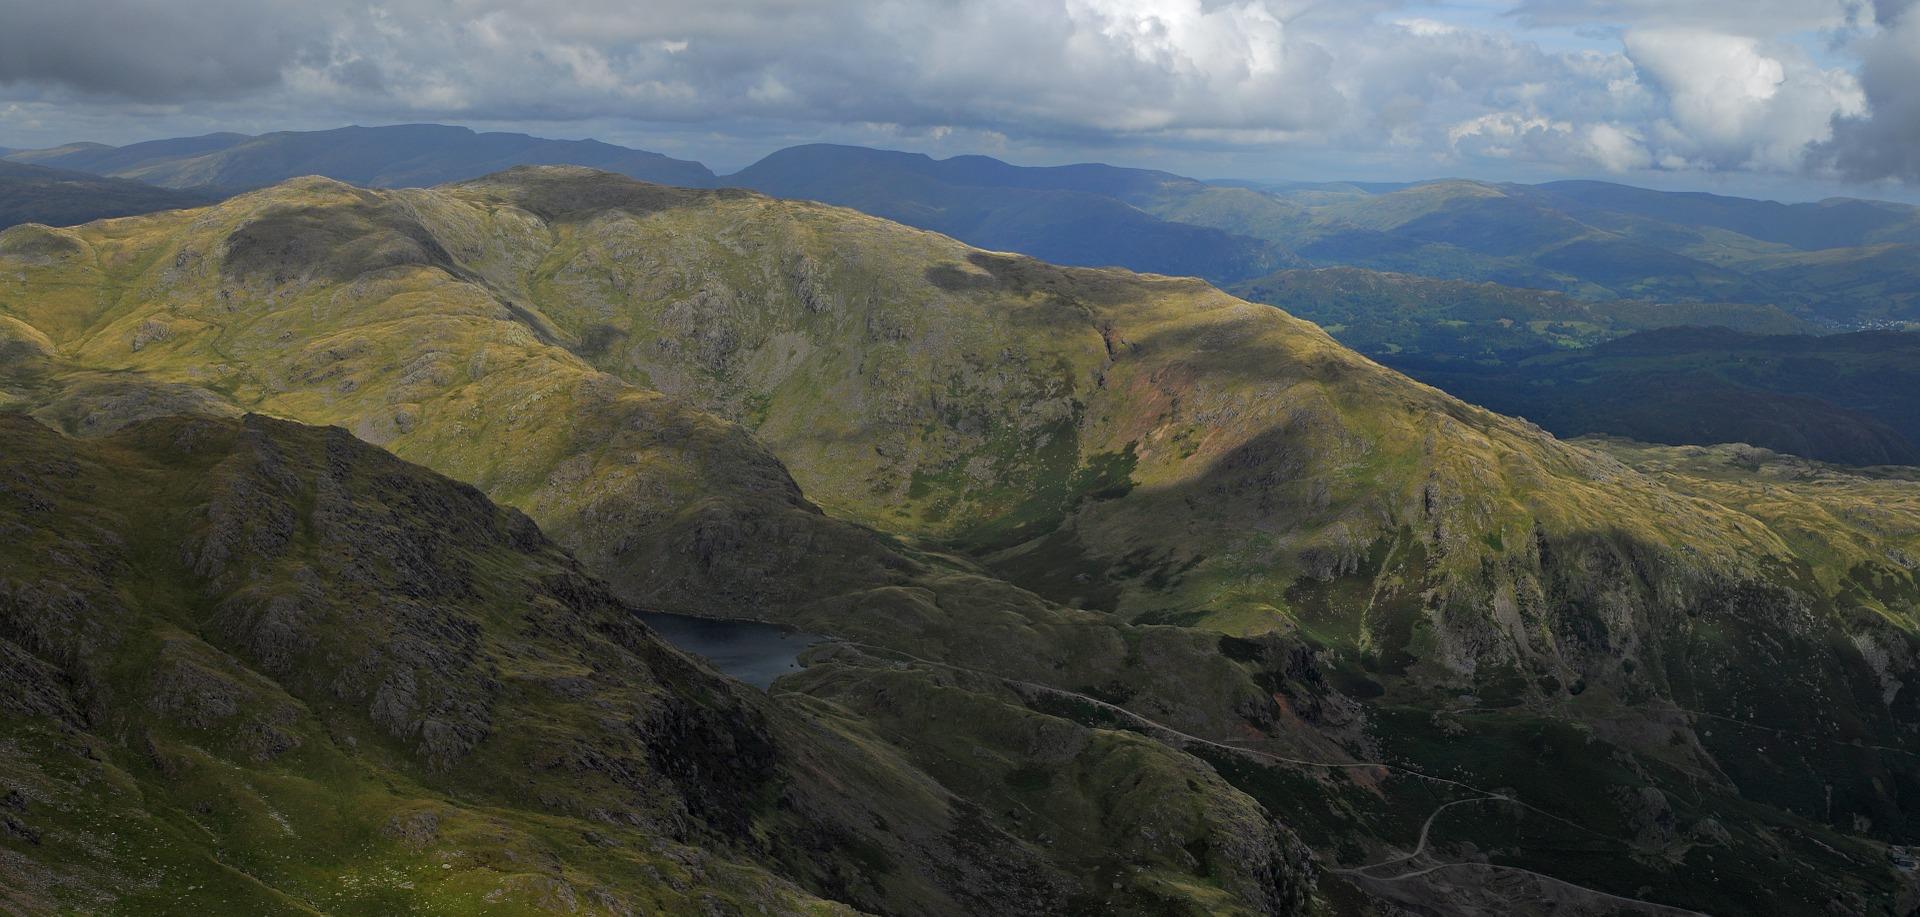 UK STAYCATION IDEAS: Lake District